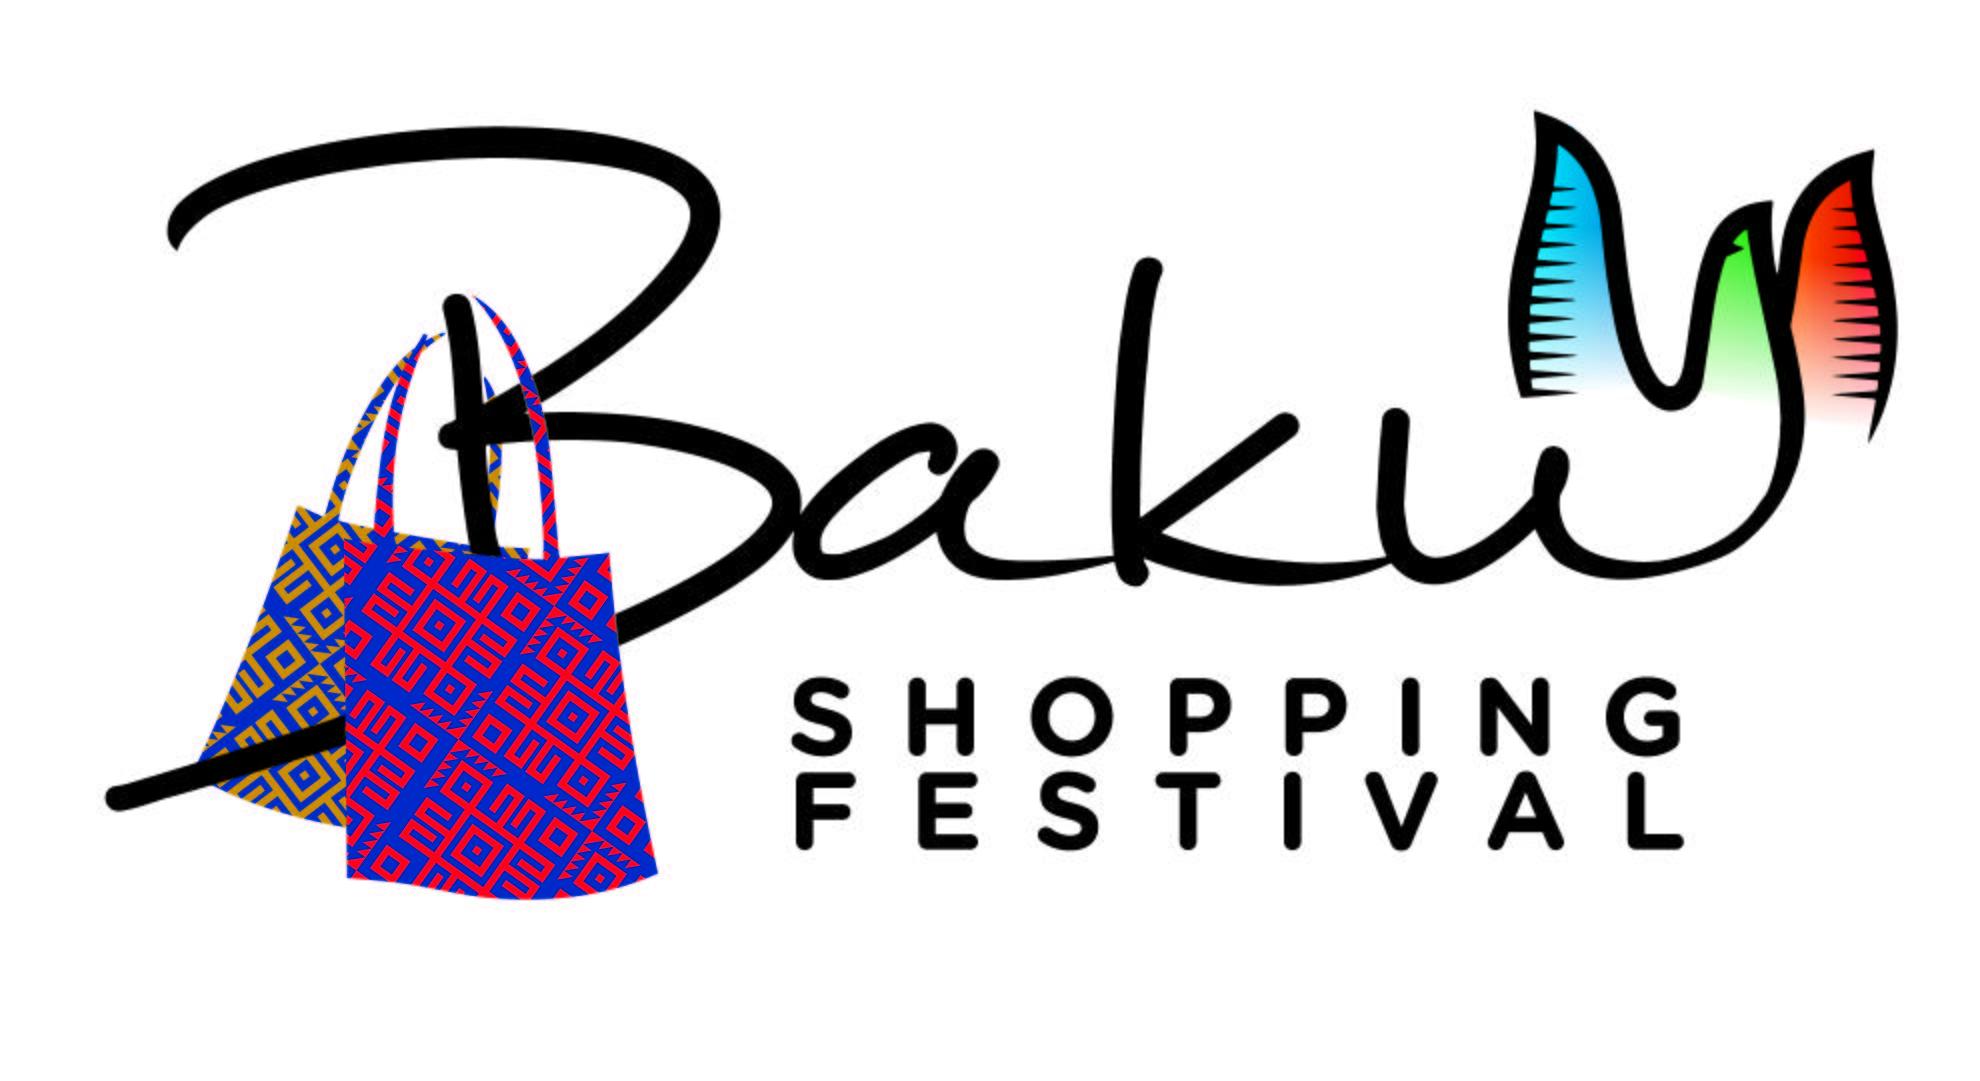 Baku Shopping Festival 2018 starts in May